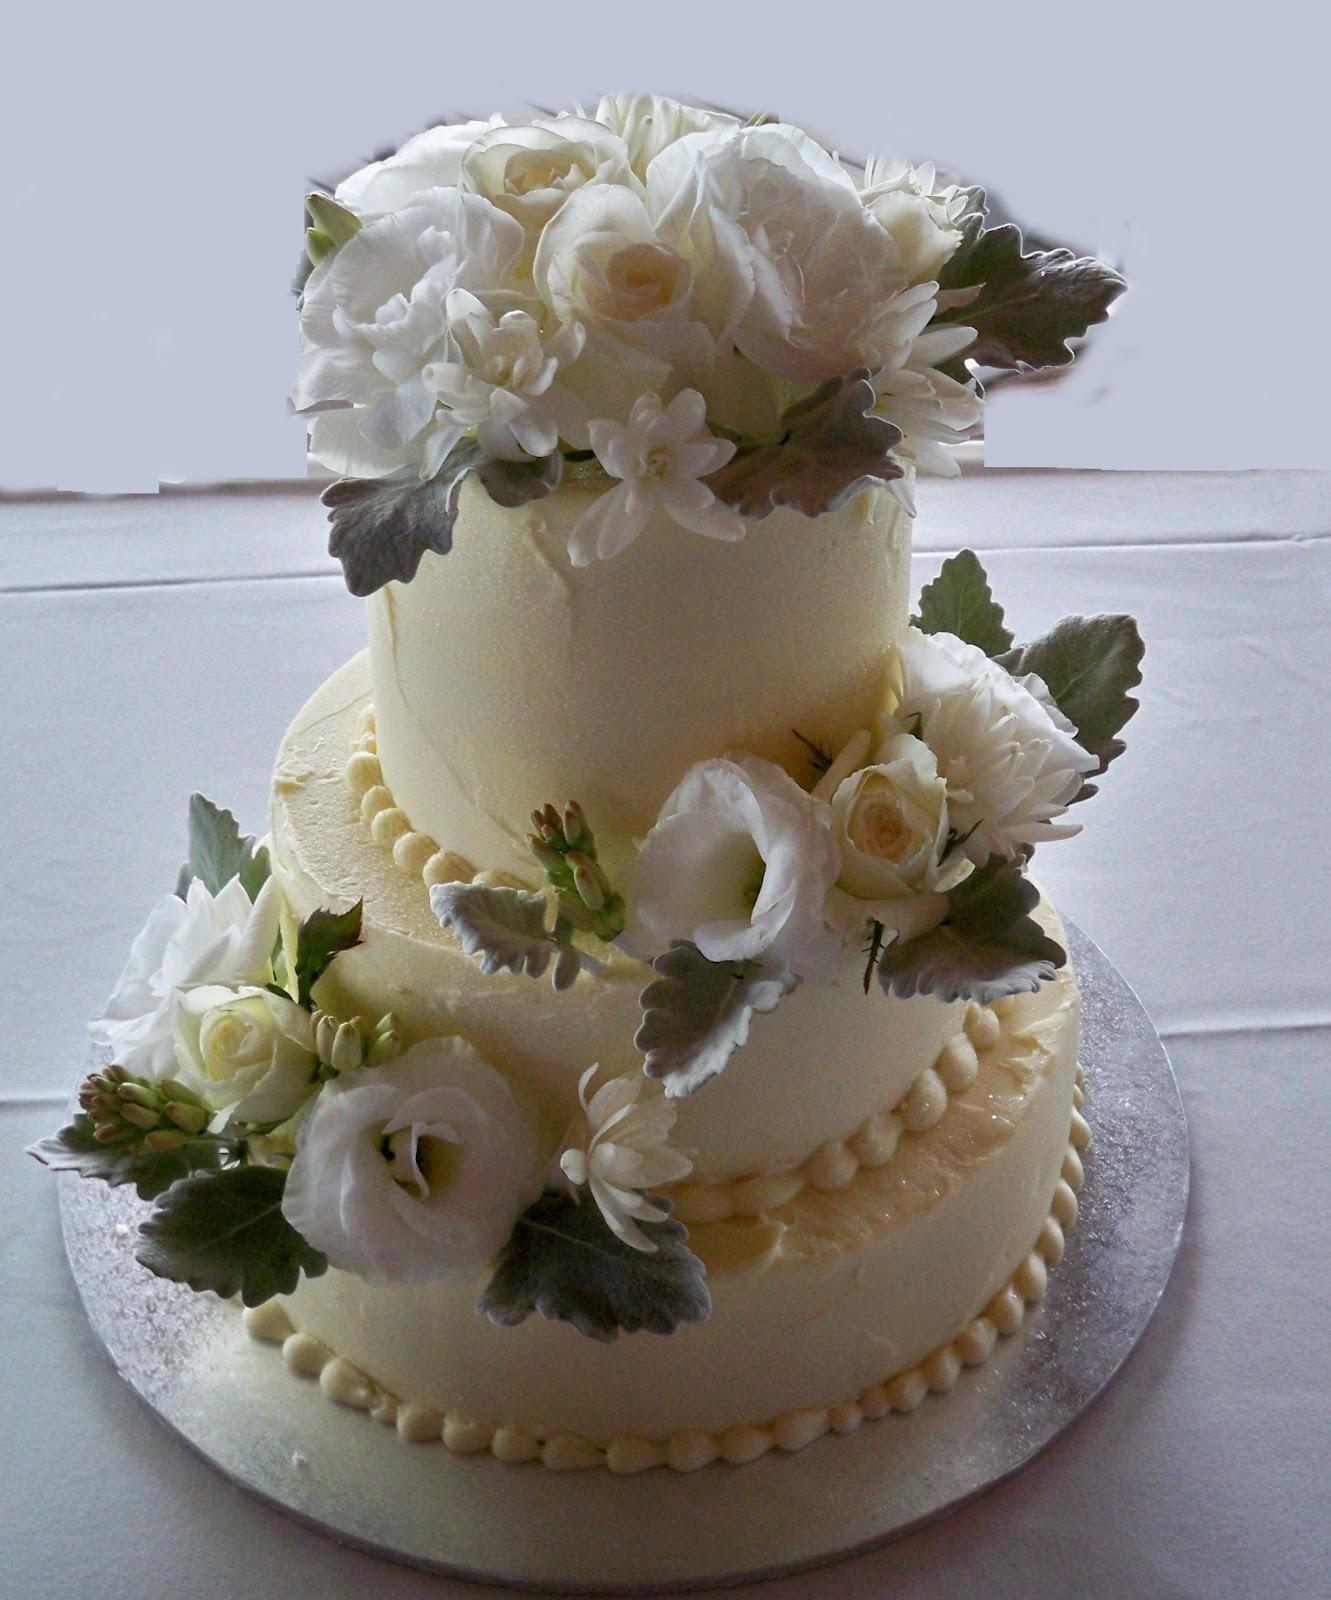 simple 3 tier chocolate ganache iced wedding cake with